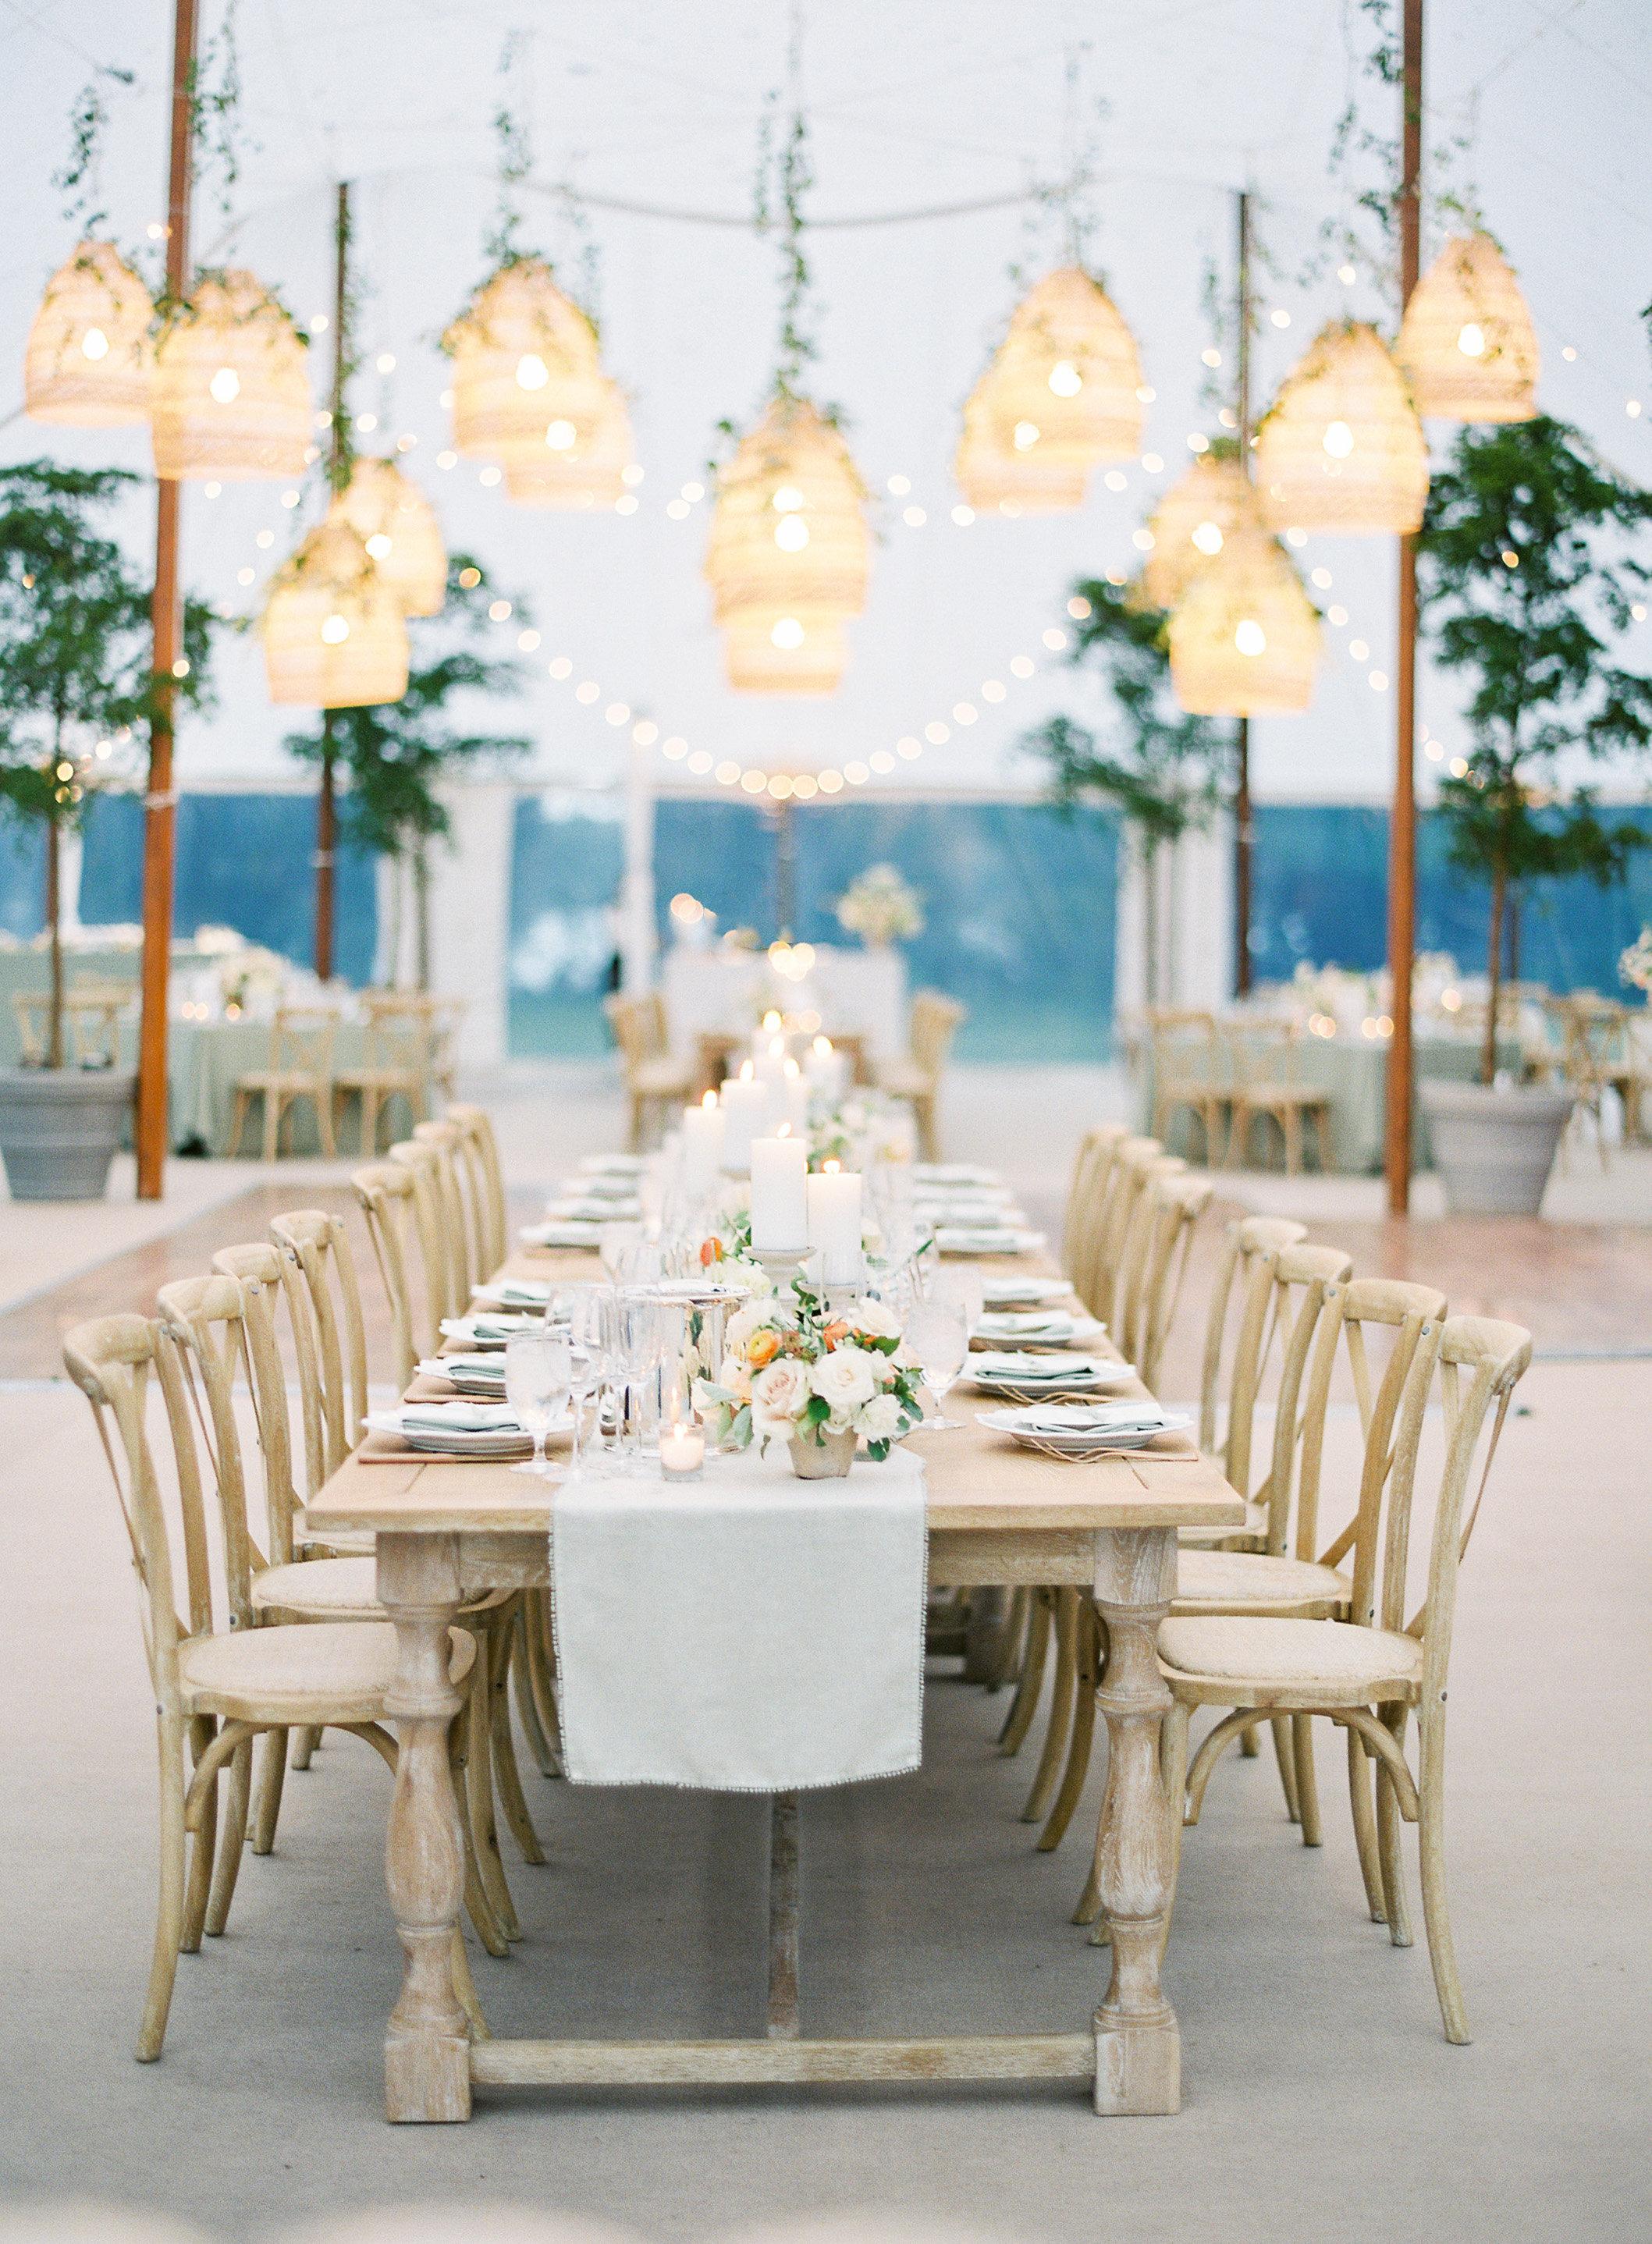 lauren alex wedding reception tables with lights hanging above